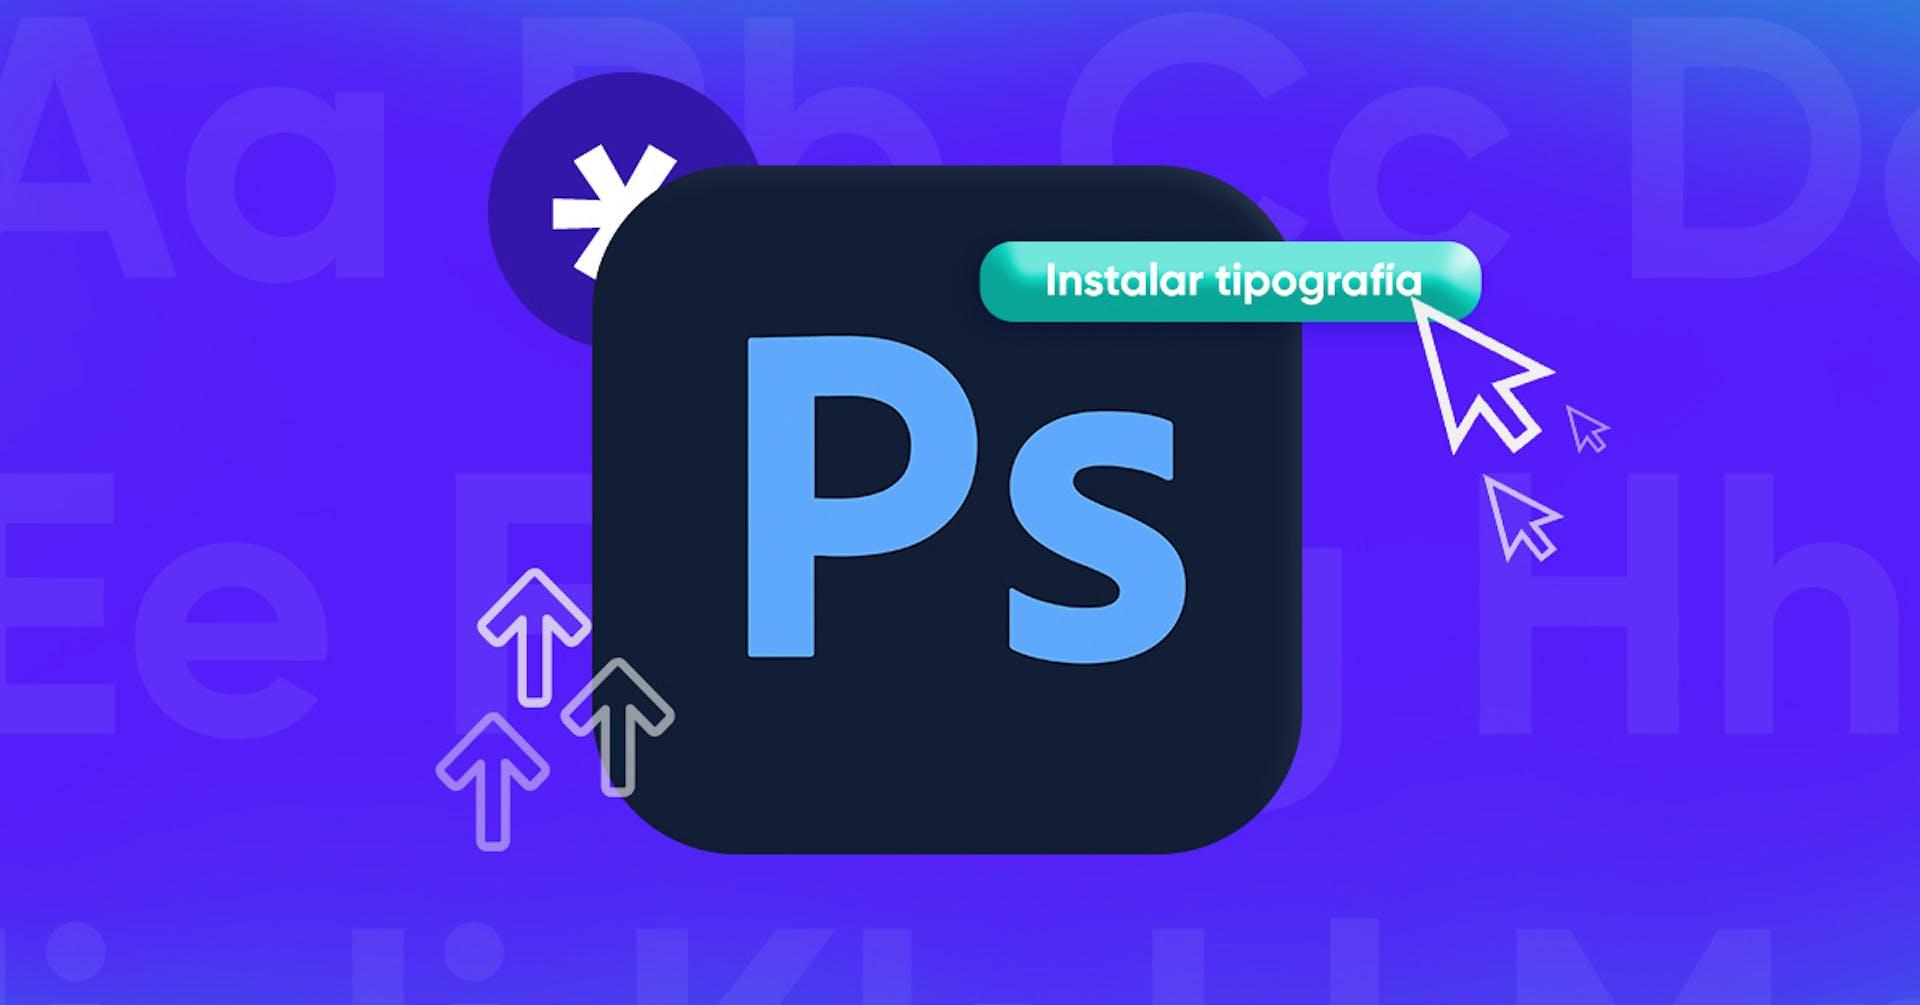 +20 fonts para Photoshop gratis: mejora tus piezas digitales